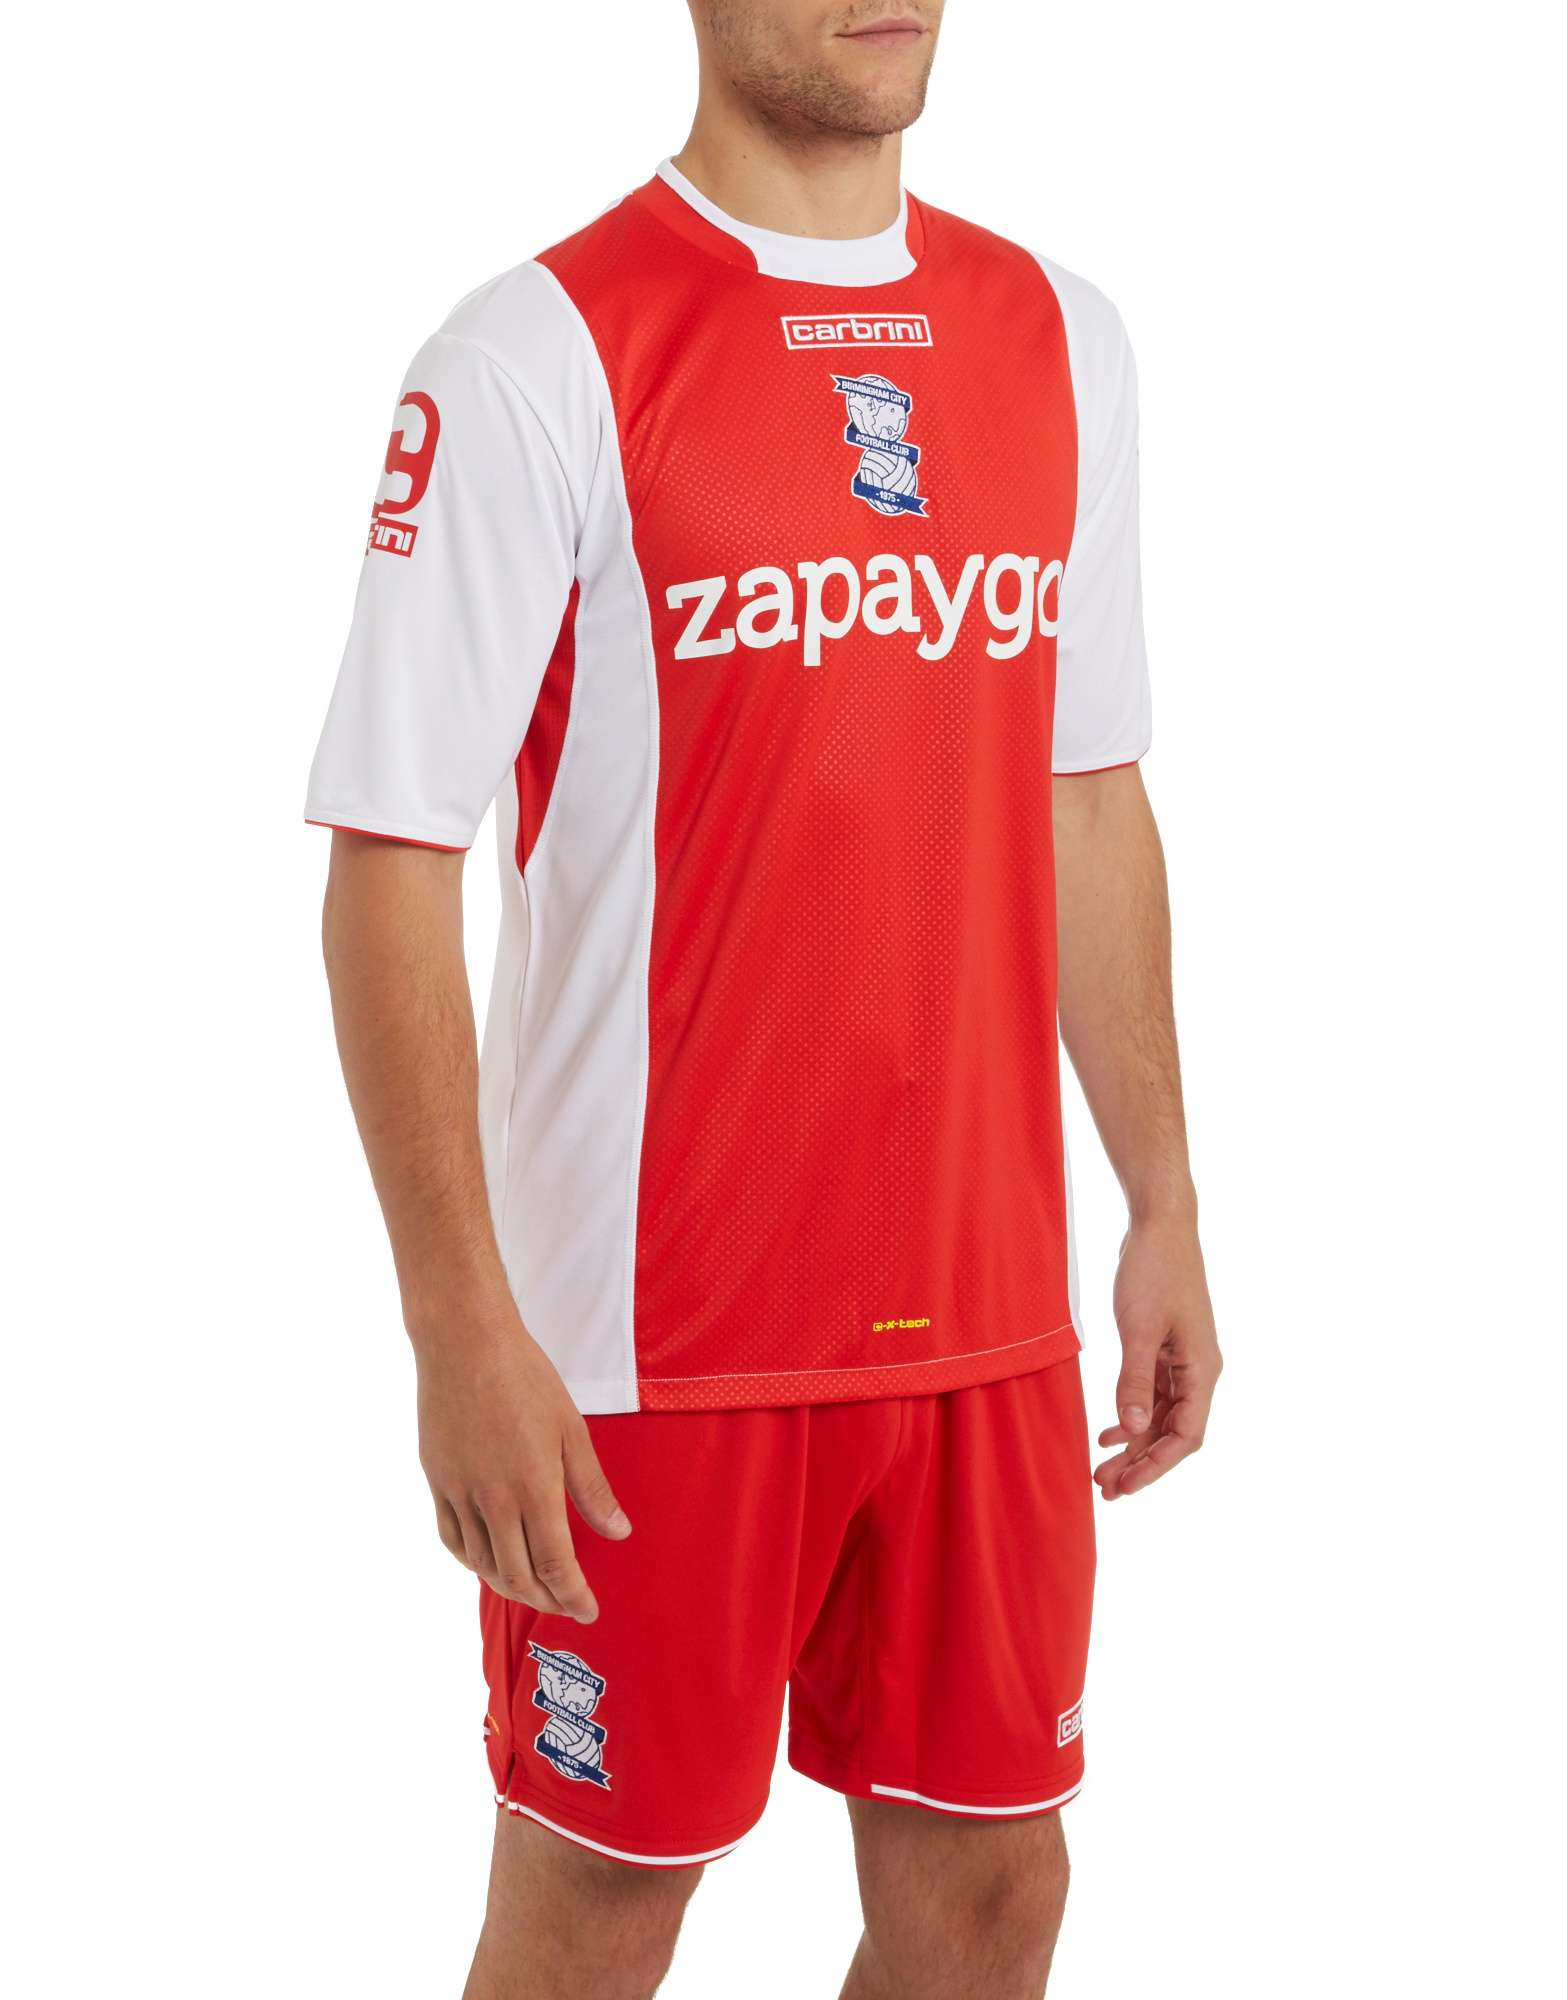 Carbrini Birmingham City FC 2014 Away Shirt